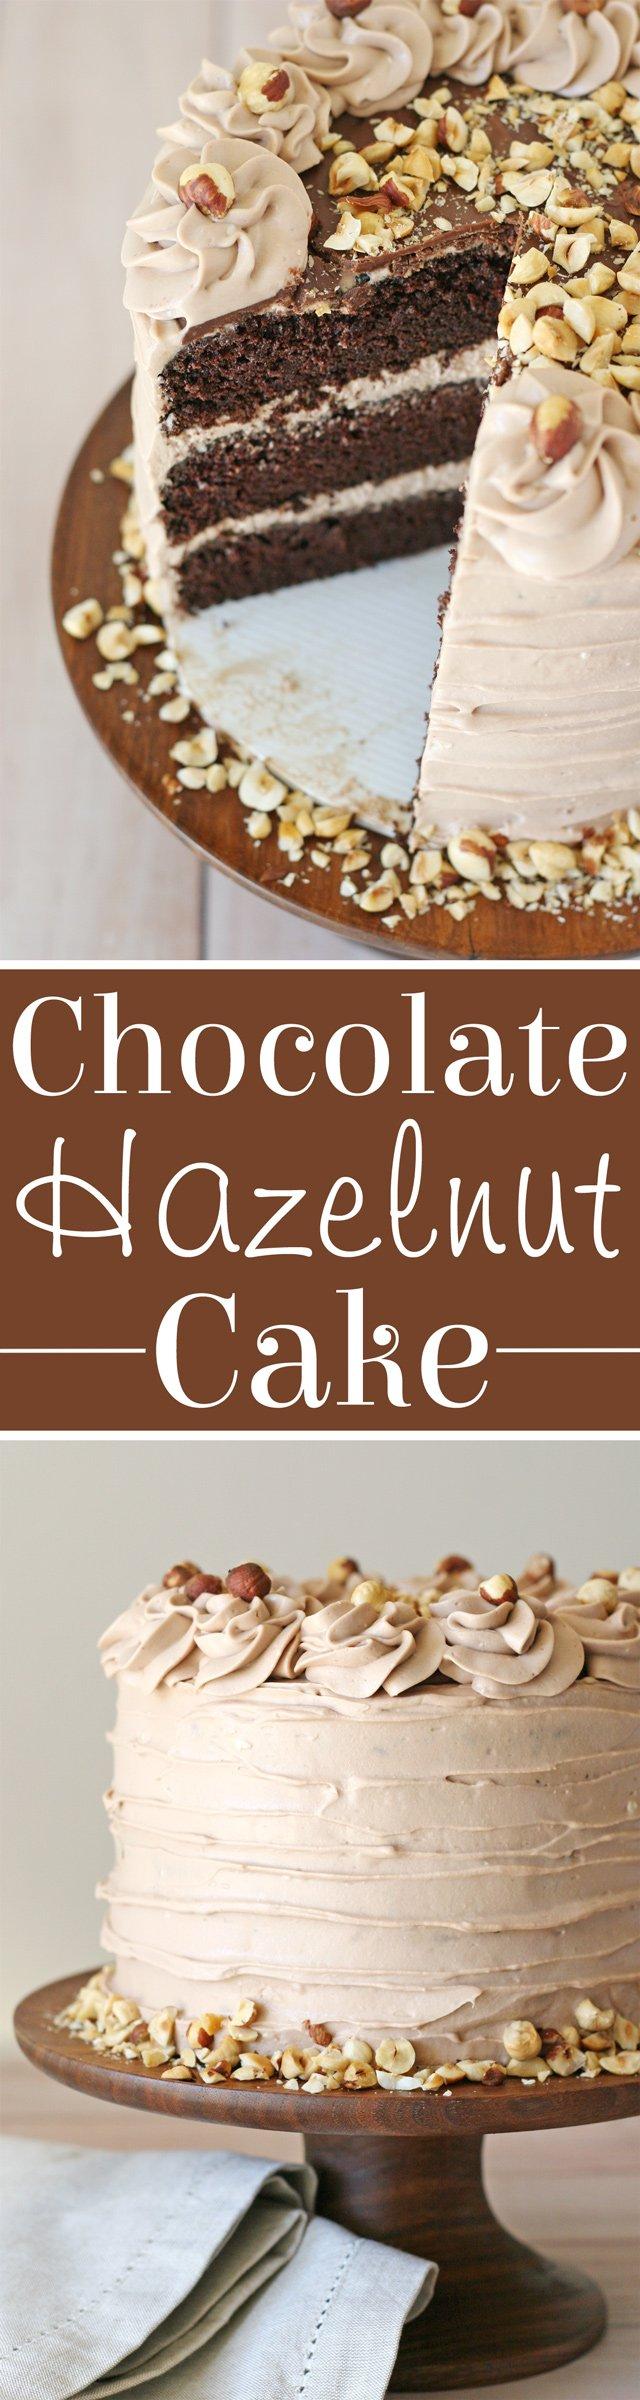 Chocolate Hazelnut Cake Recipe... YUM!